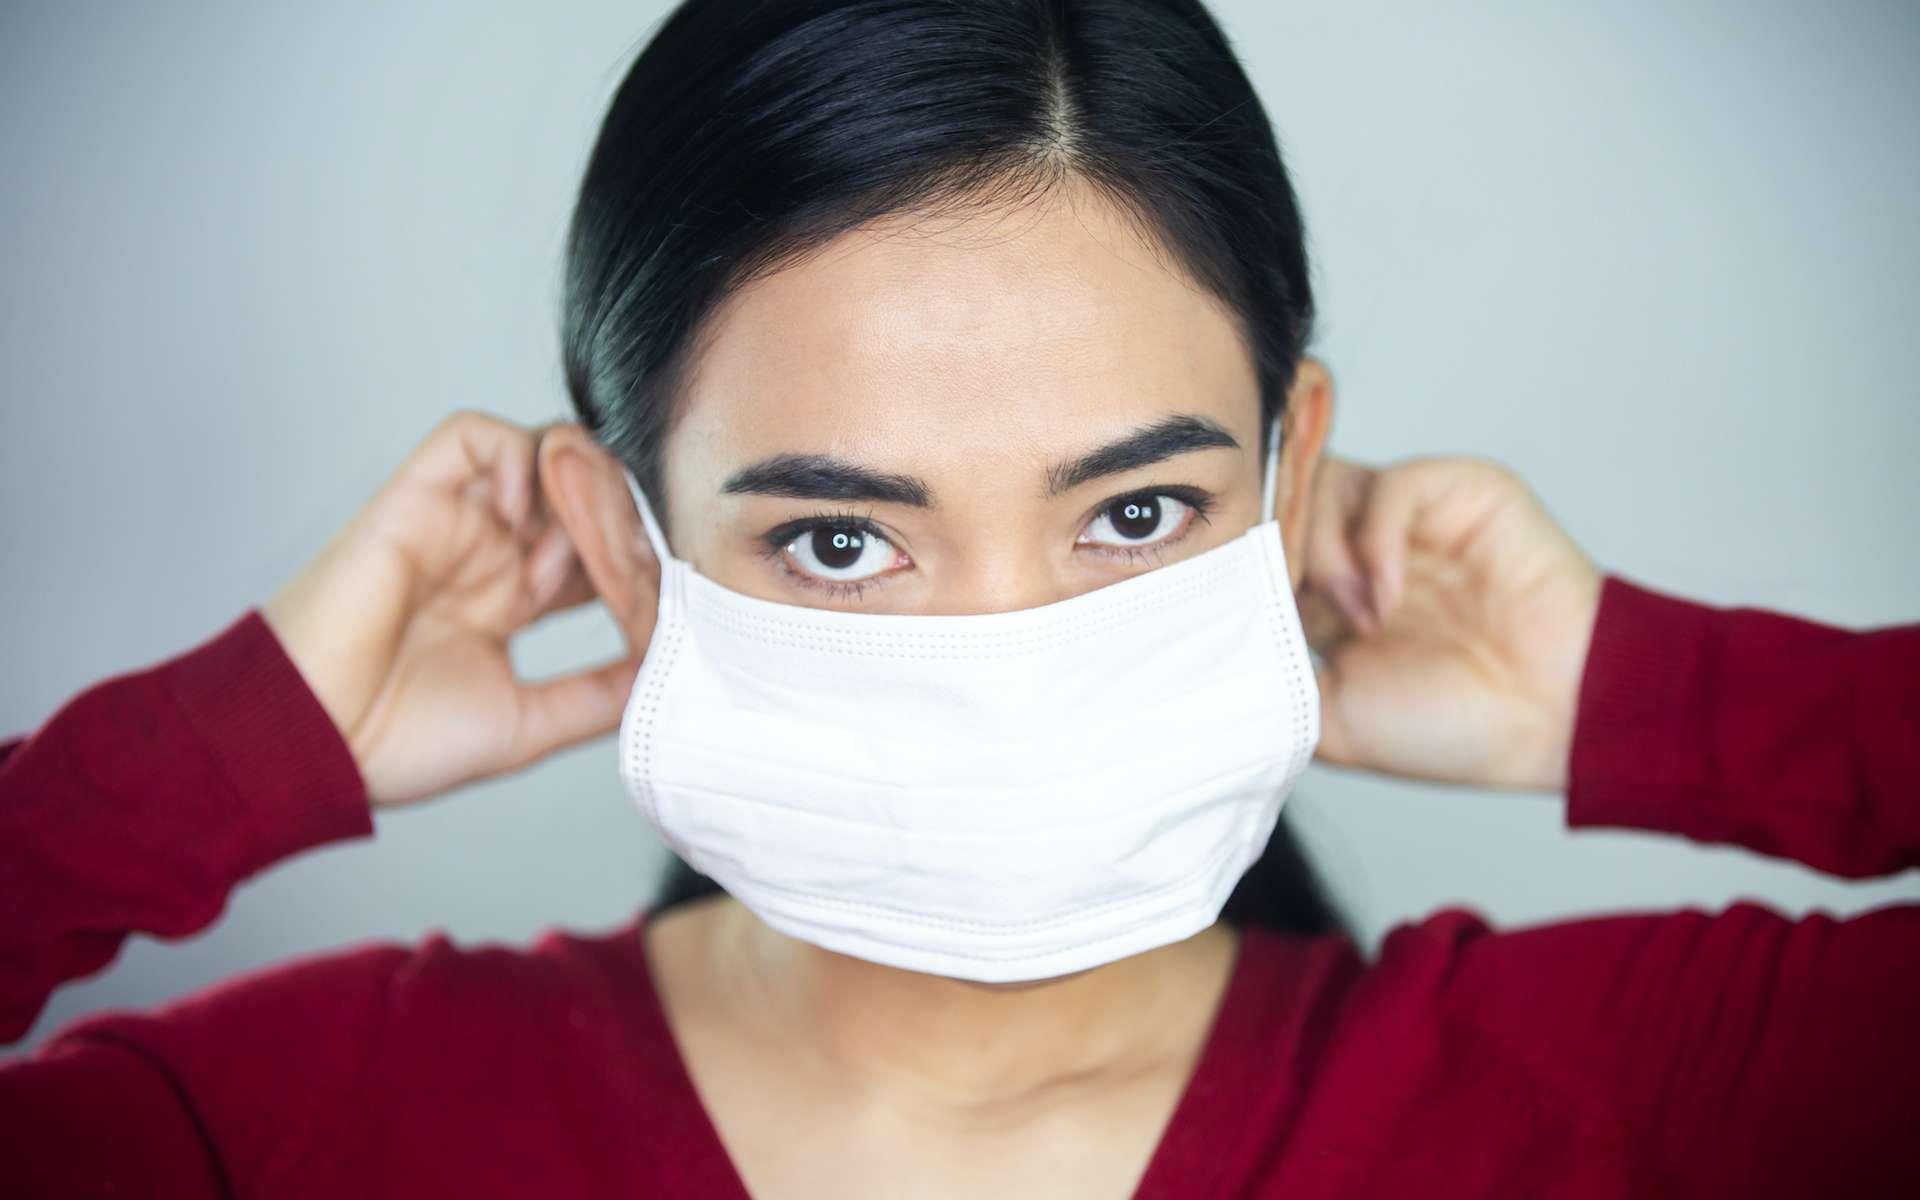 Comment bien porter son masque. © Pratiwi, Adobe Stock